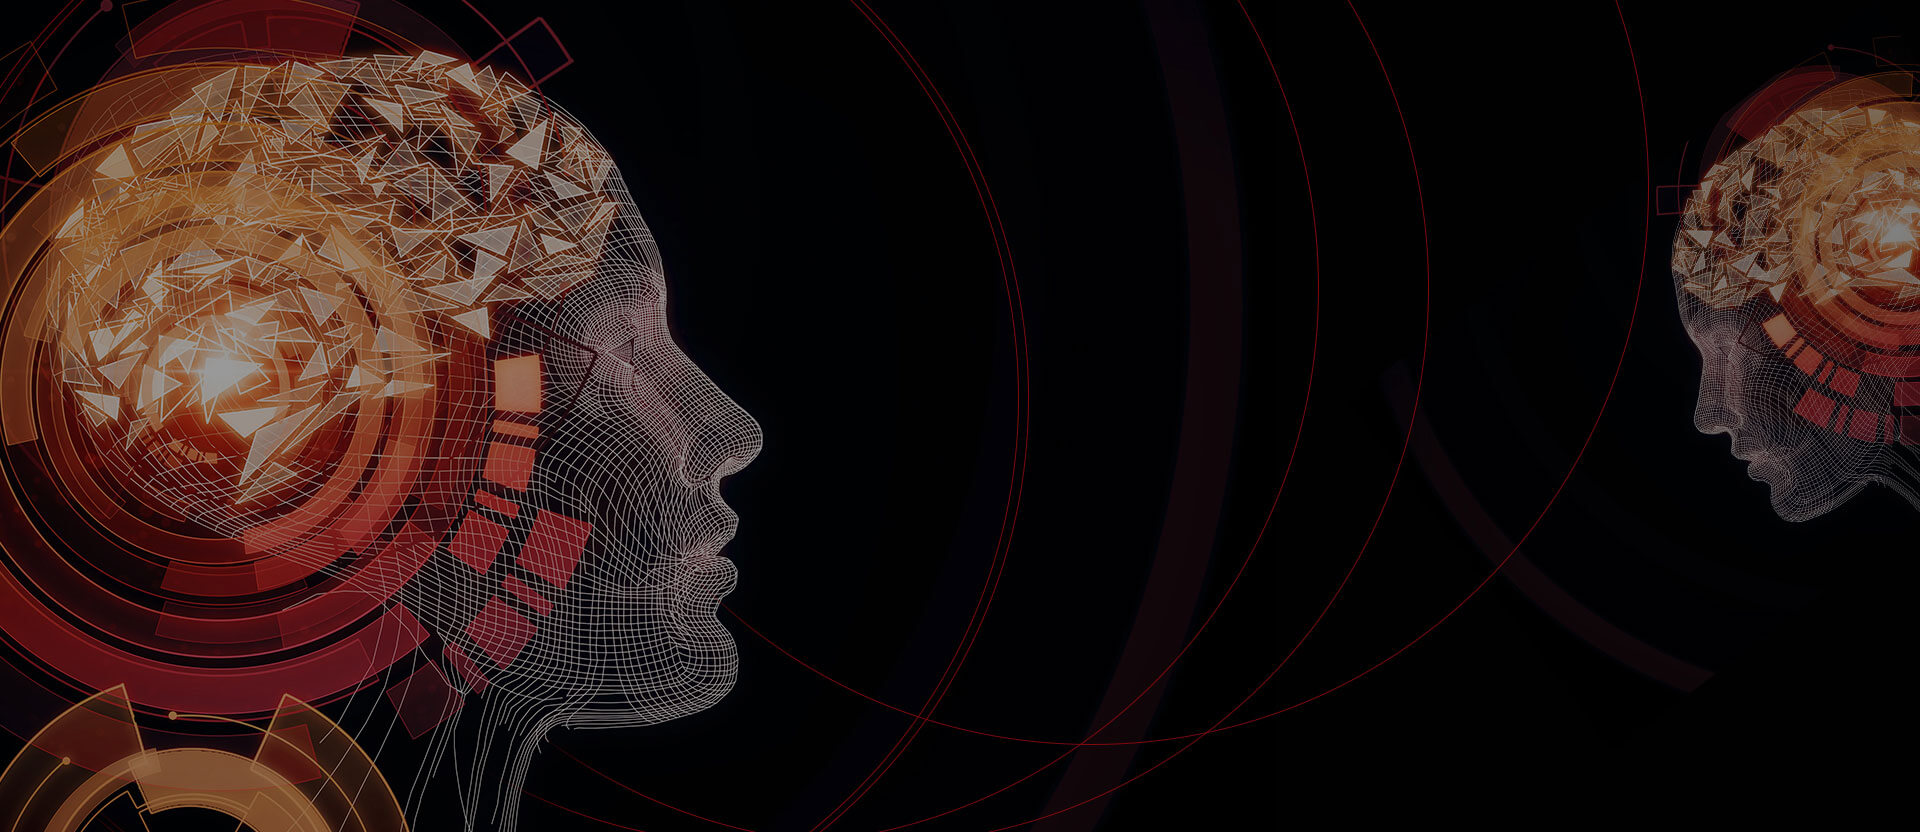 5-5-2019 future artificial intelligence